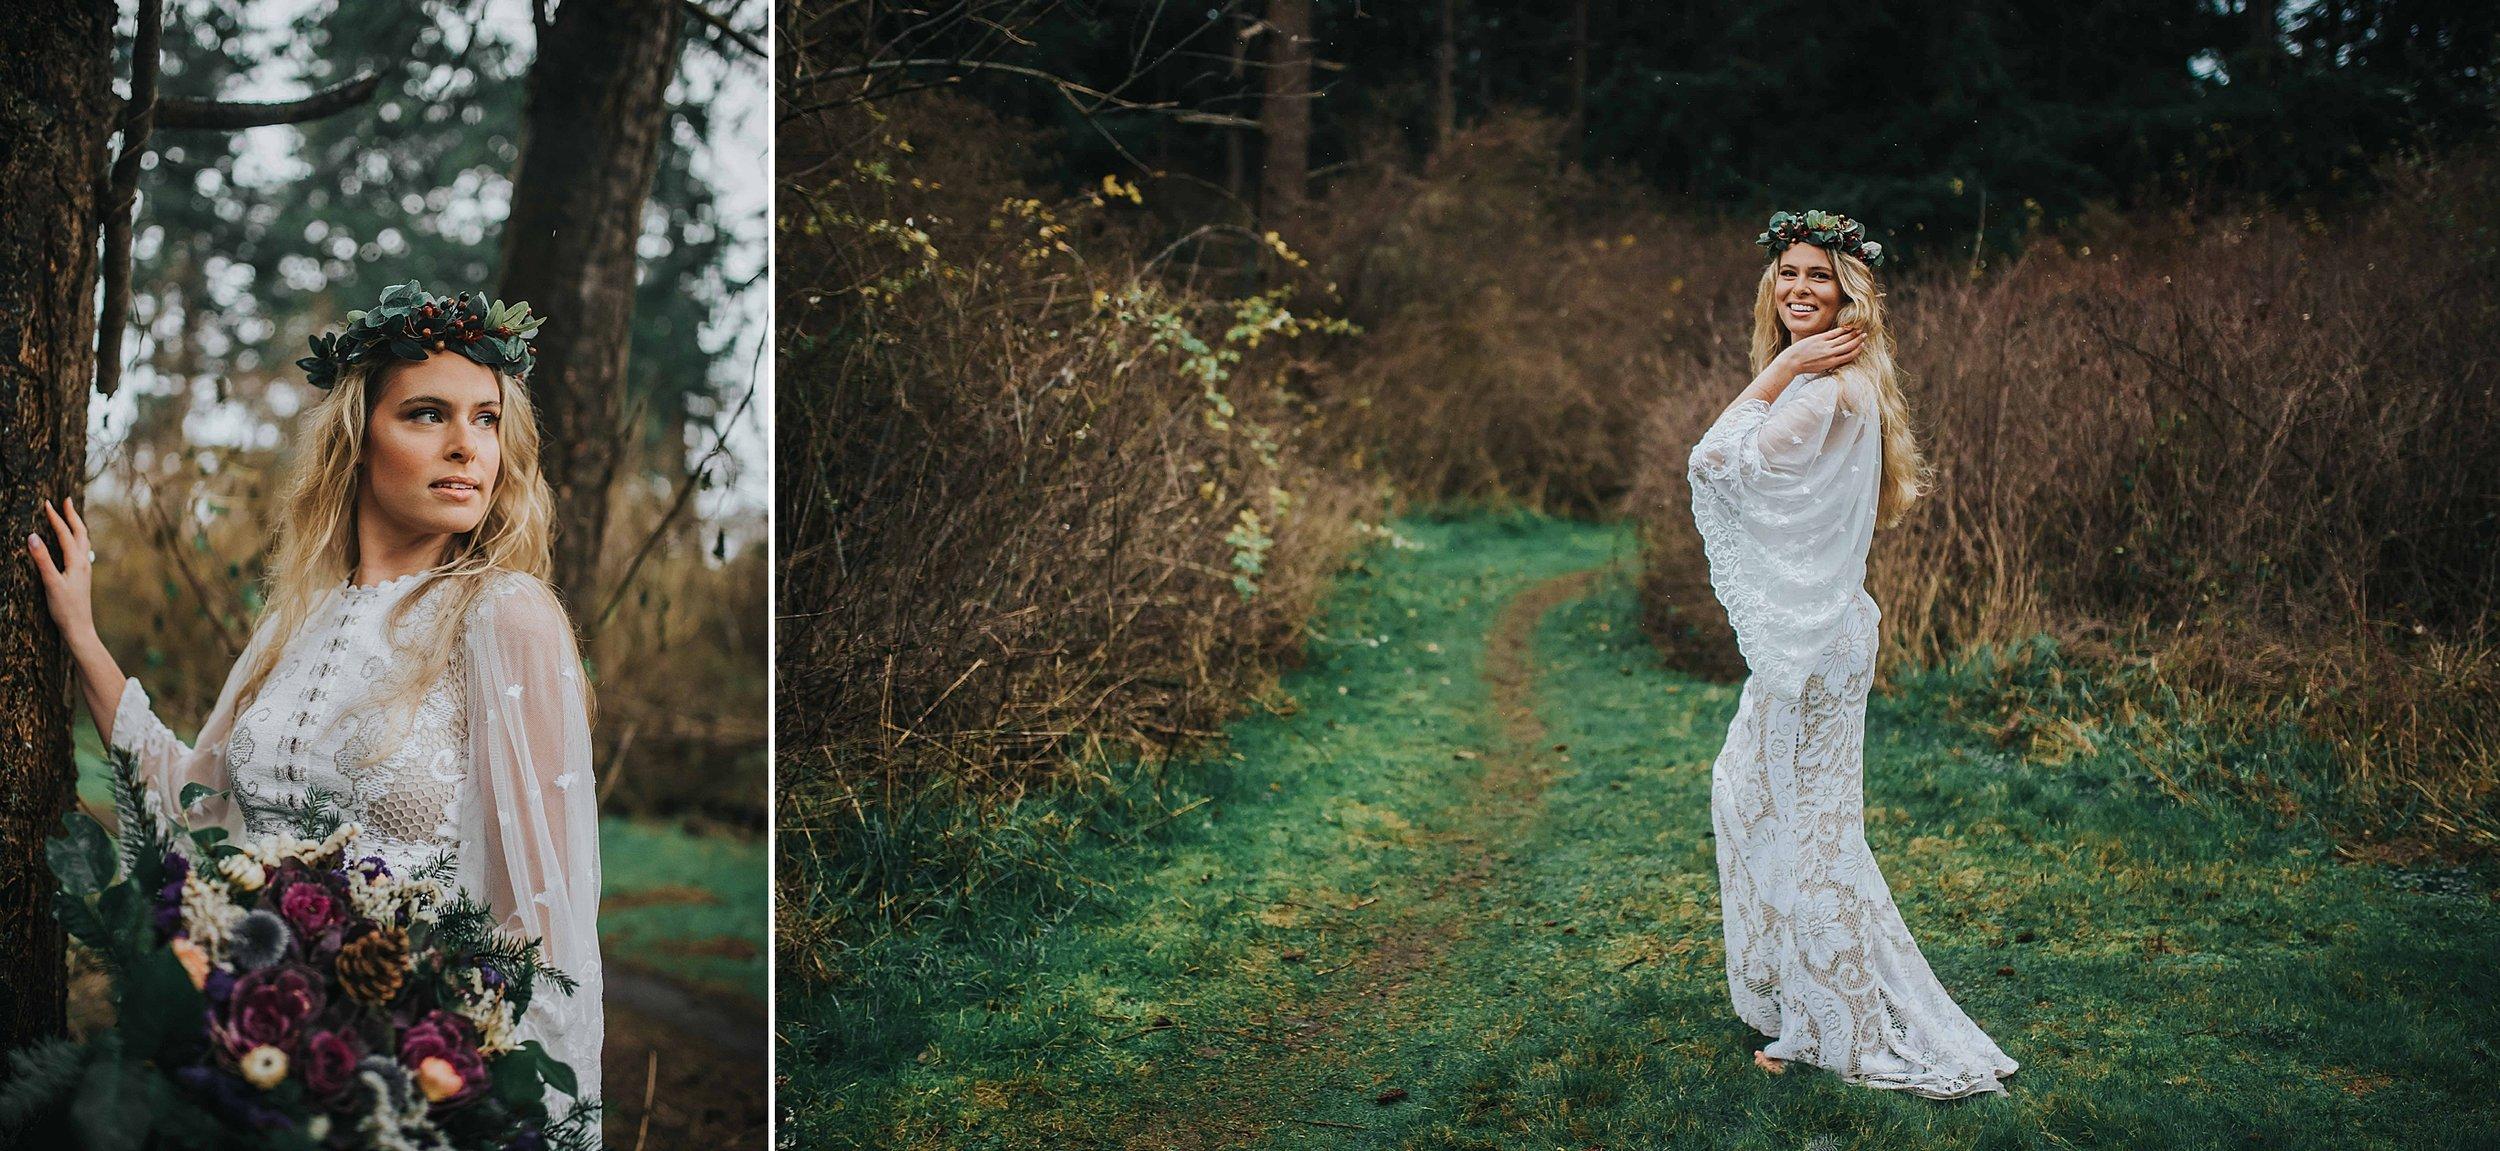 Wedding-photographer-J HODGES PHOTOGRAPHY_0228.jpg